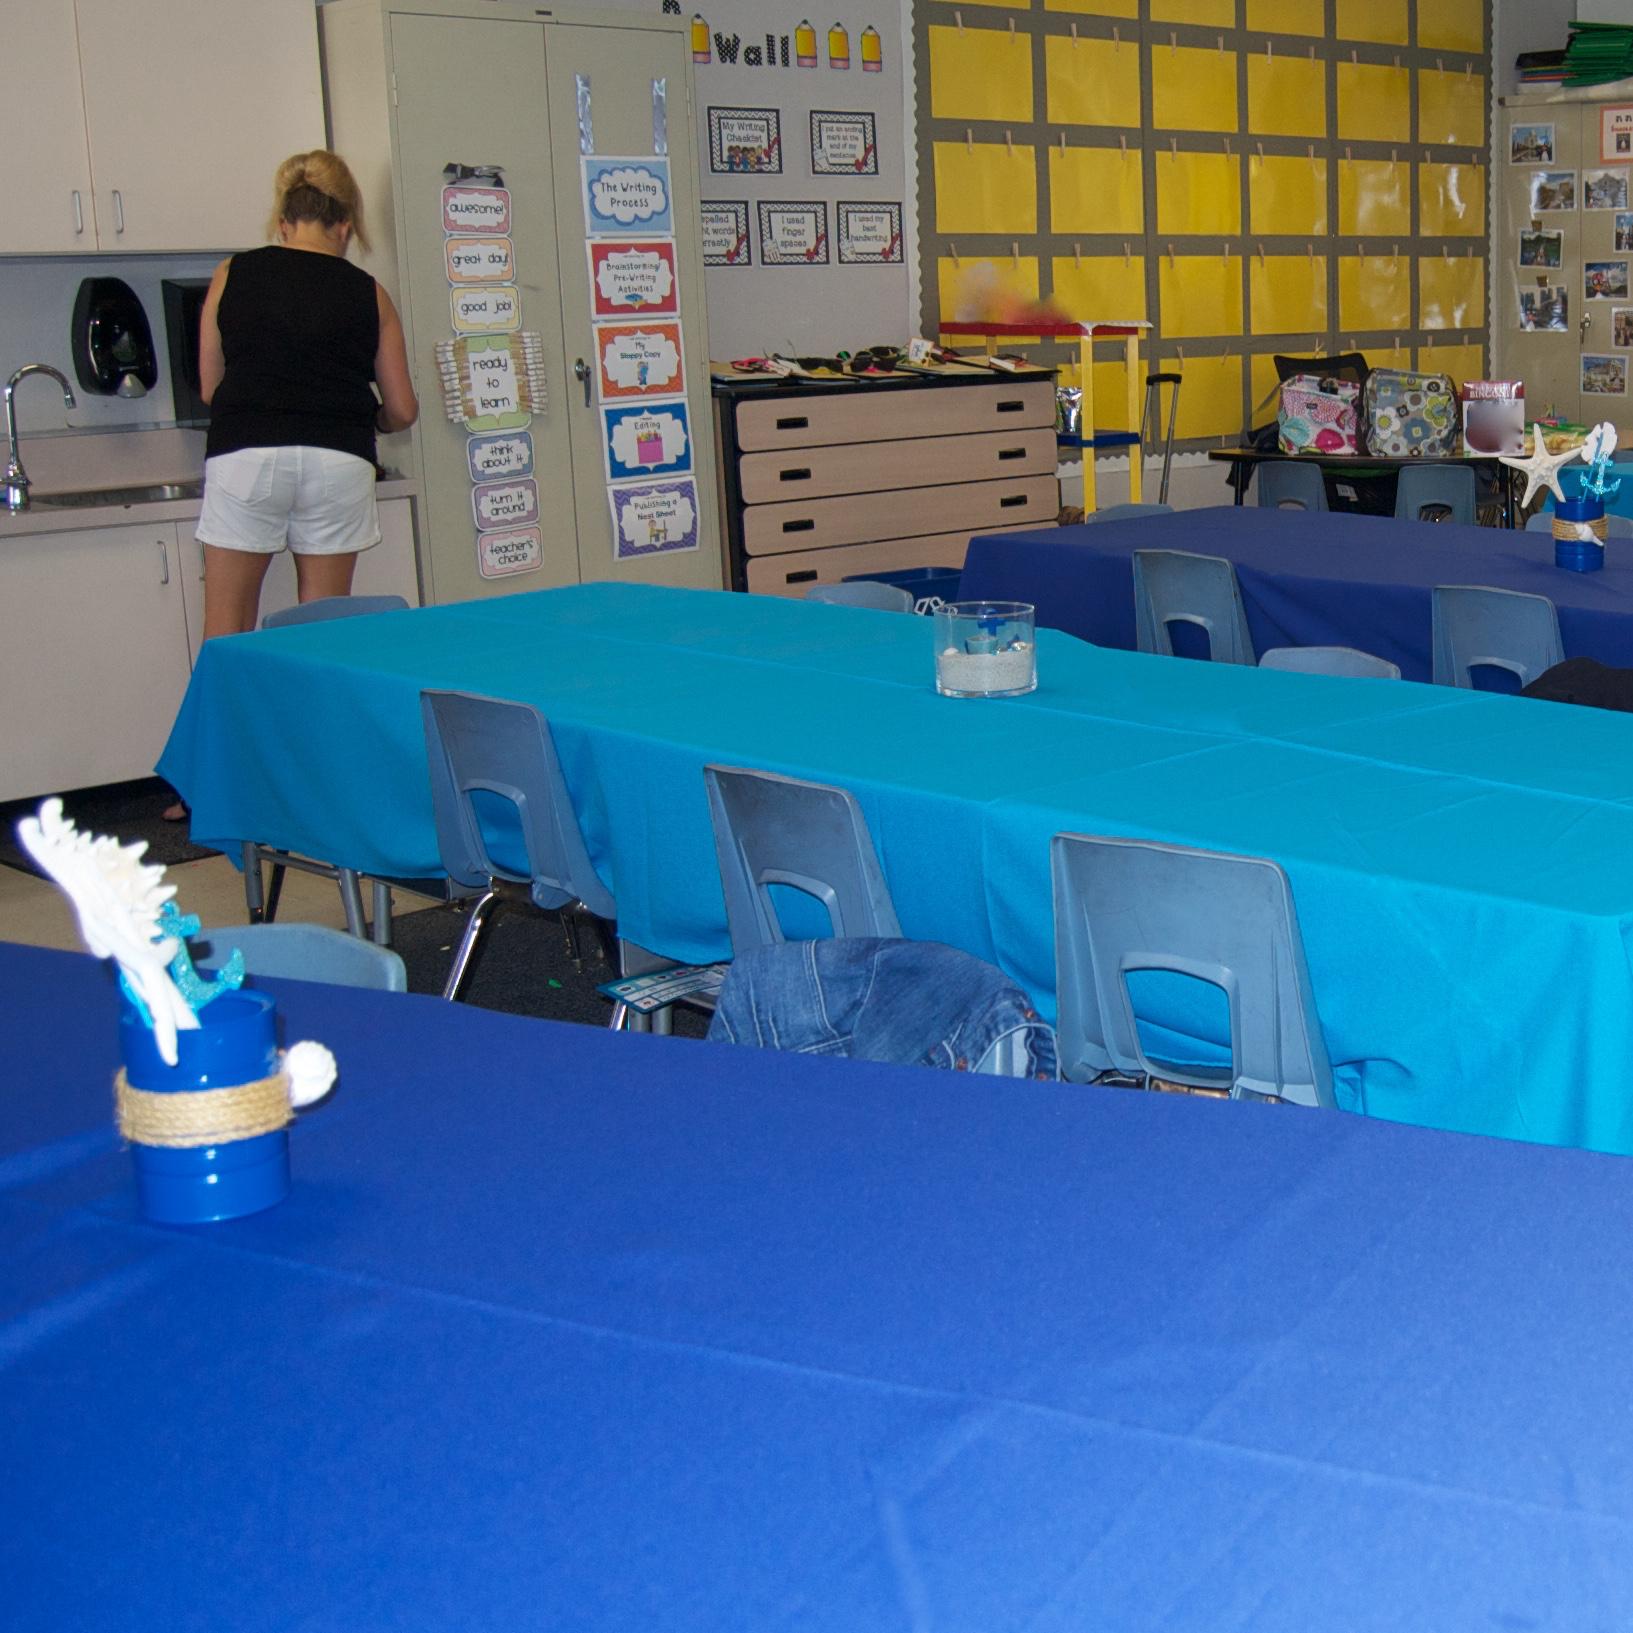 Beachy Classroom Party - 1.jpg